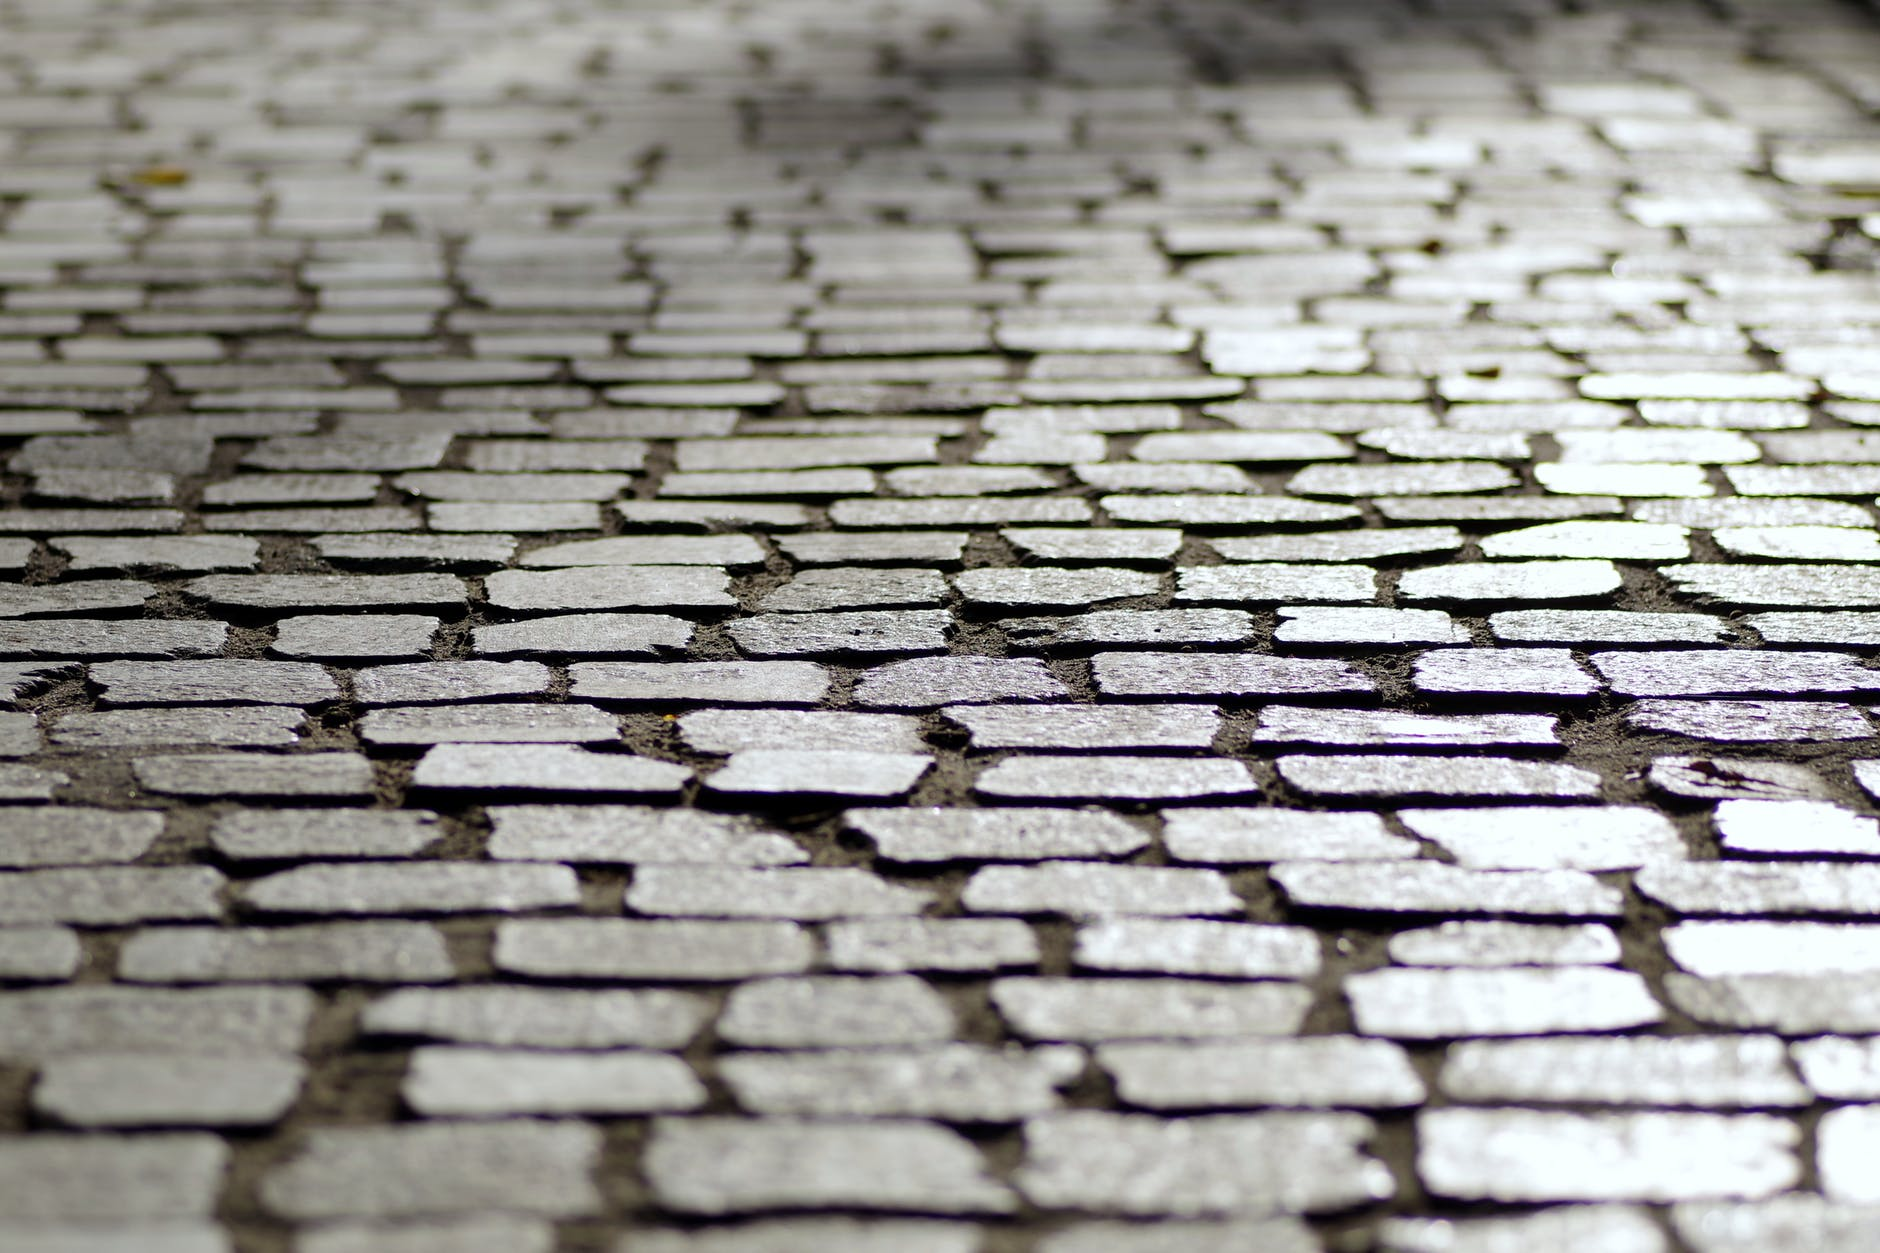 abstract brick bricks brickwork